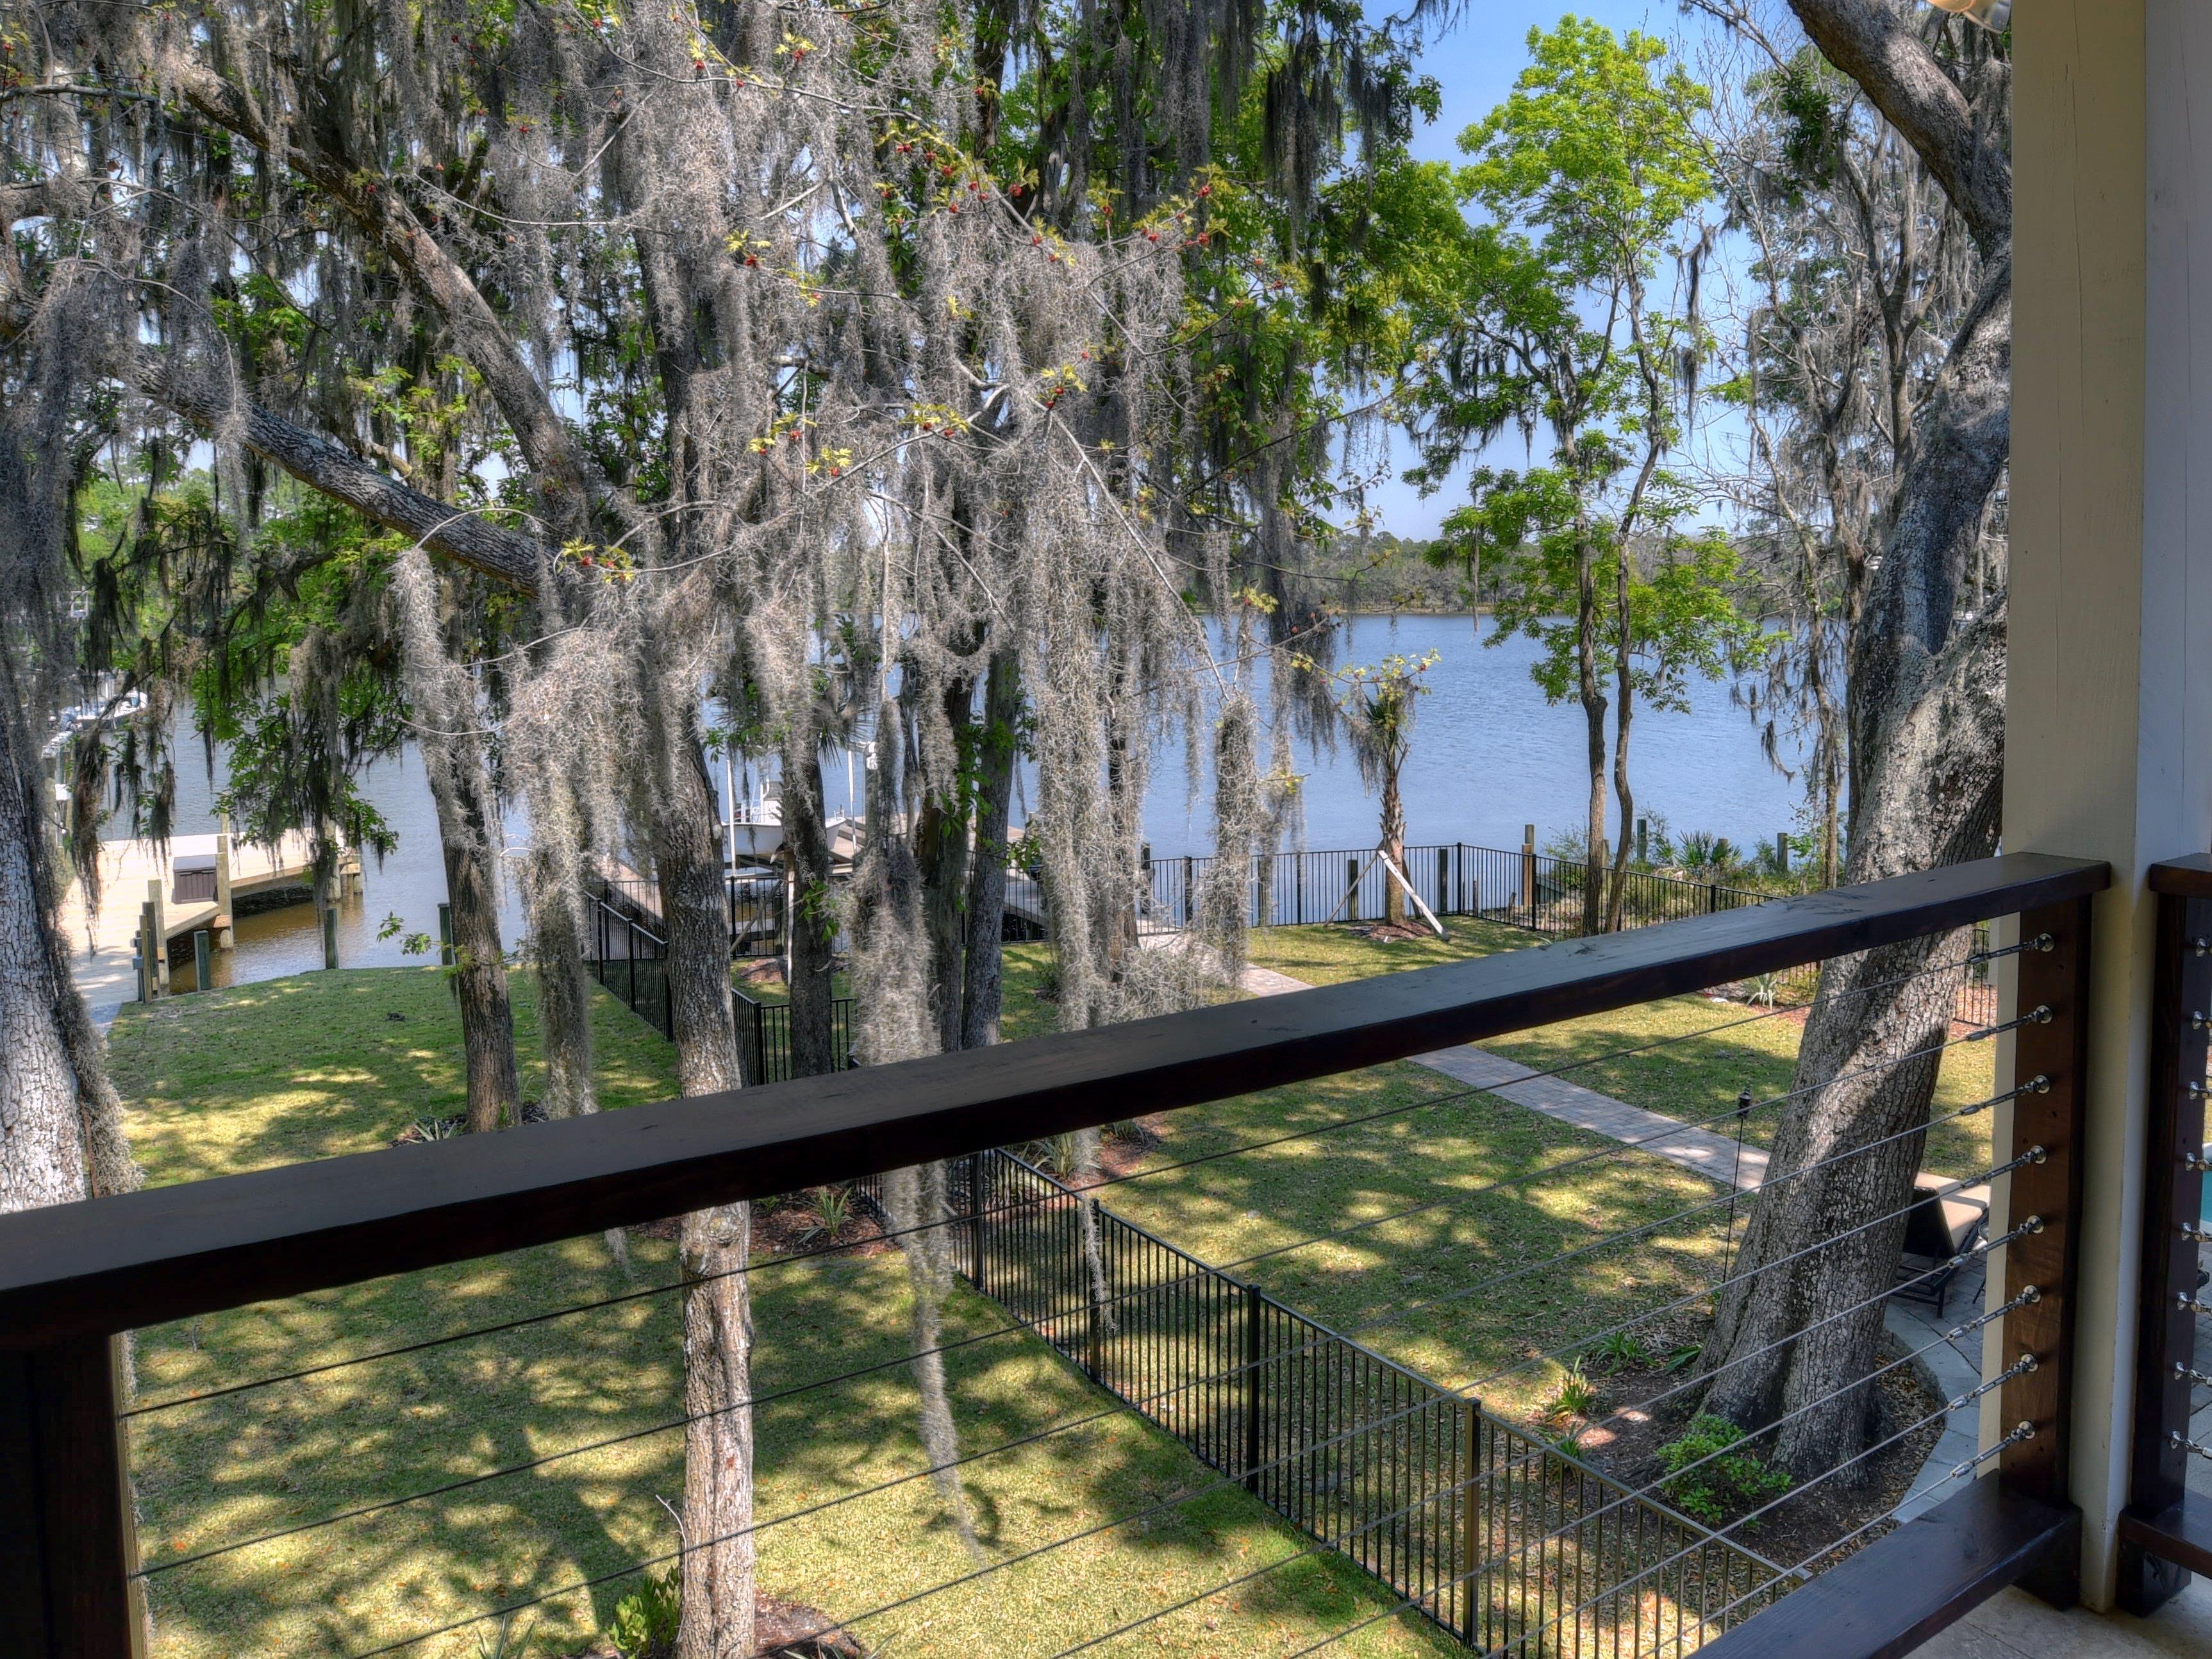 93 Beacon Point Condo rental in Sandestin Rentals ~ Cottages and Villas  in Destin Florida - #28